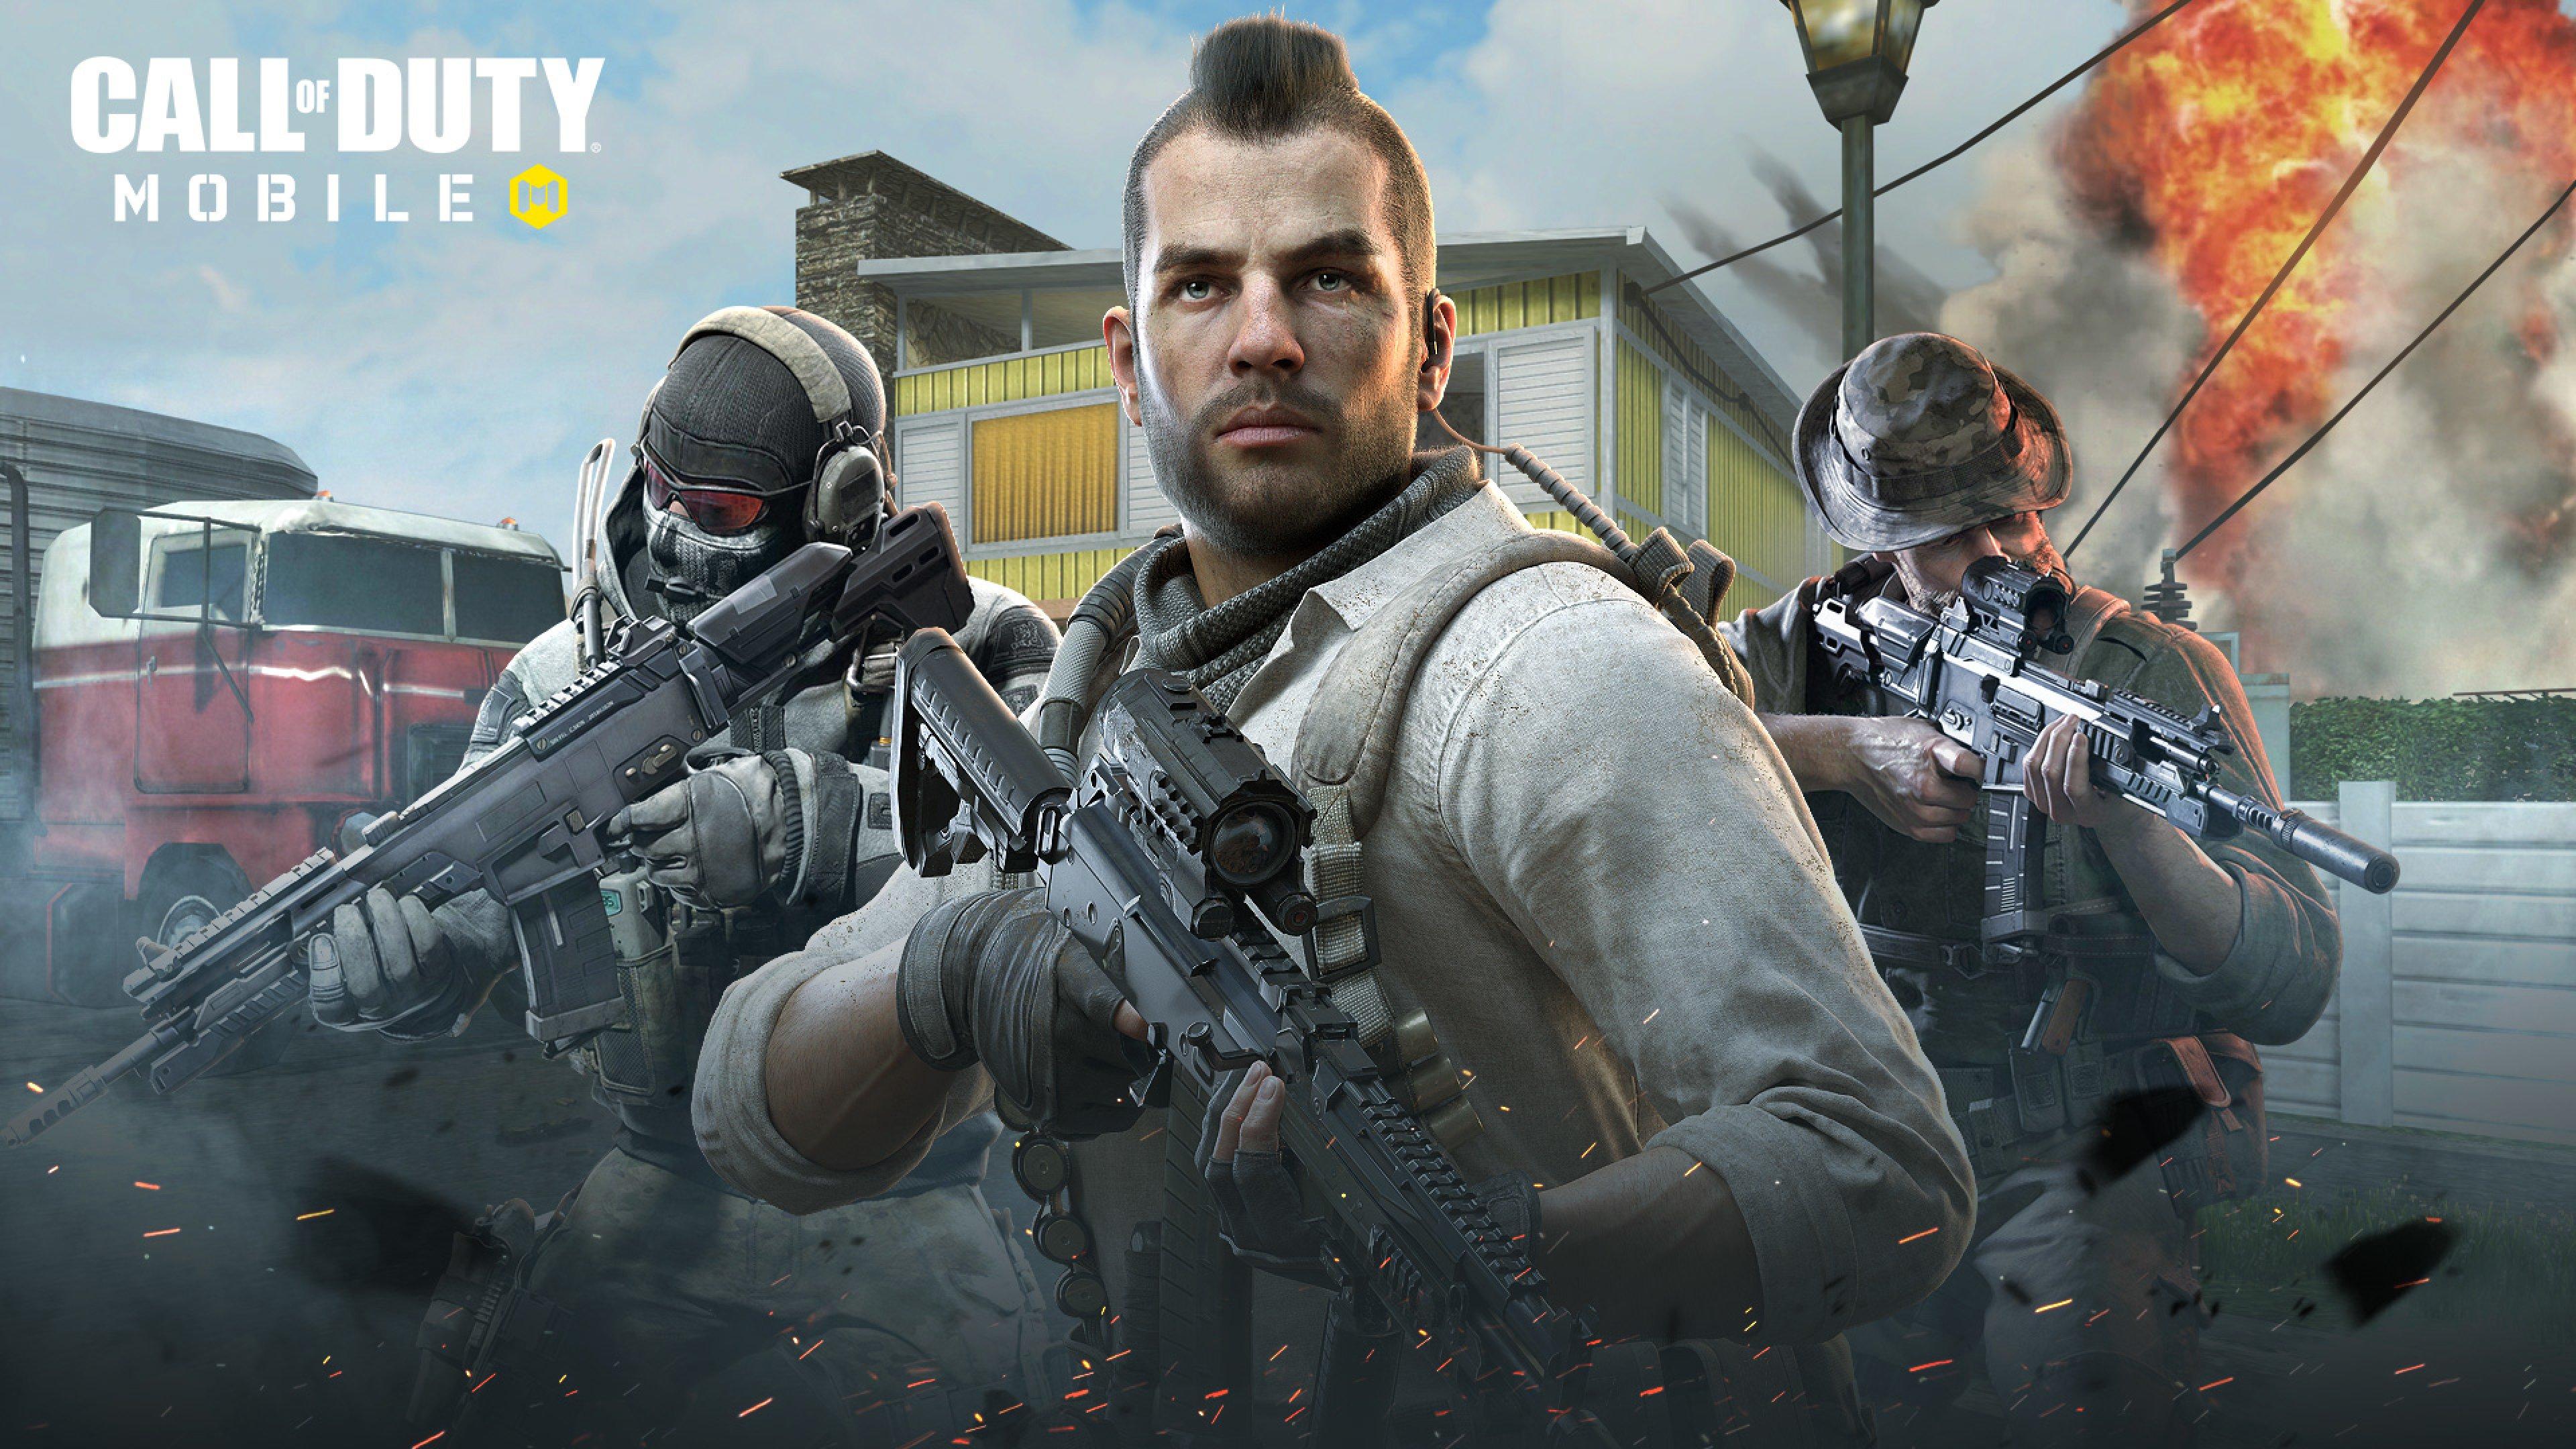 3840x2160 2019 Call Of Duty Mobile 4K Wallpaper HD Games 4K 3840x2160